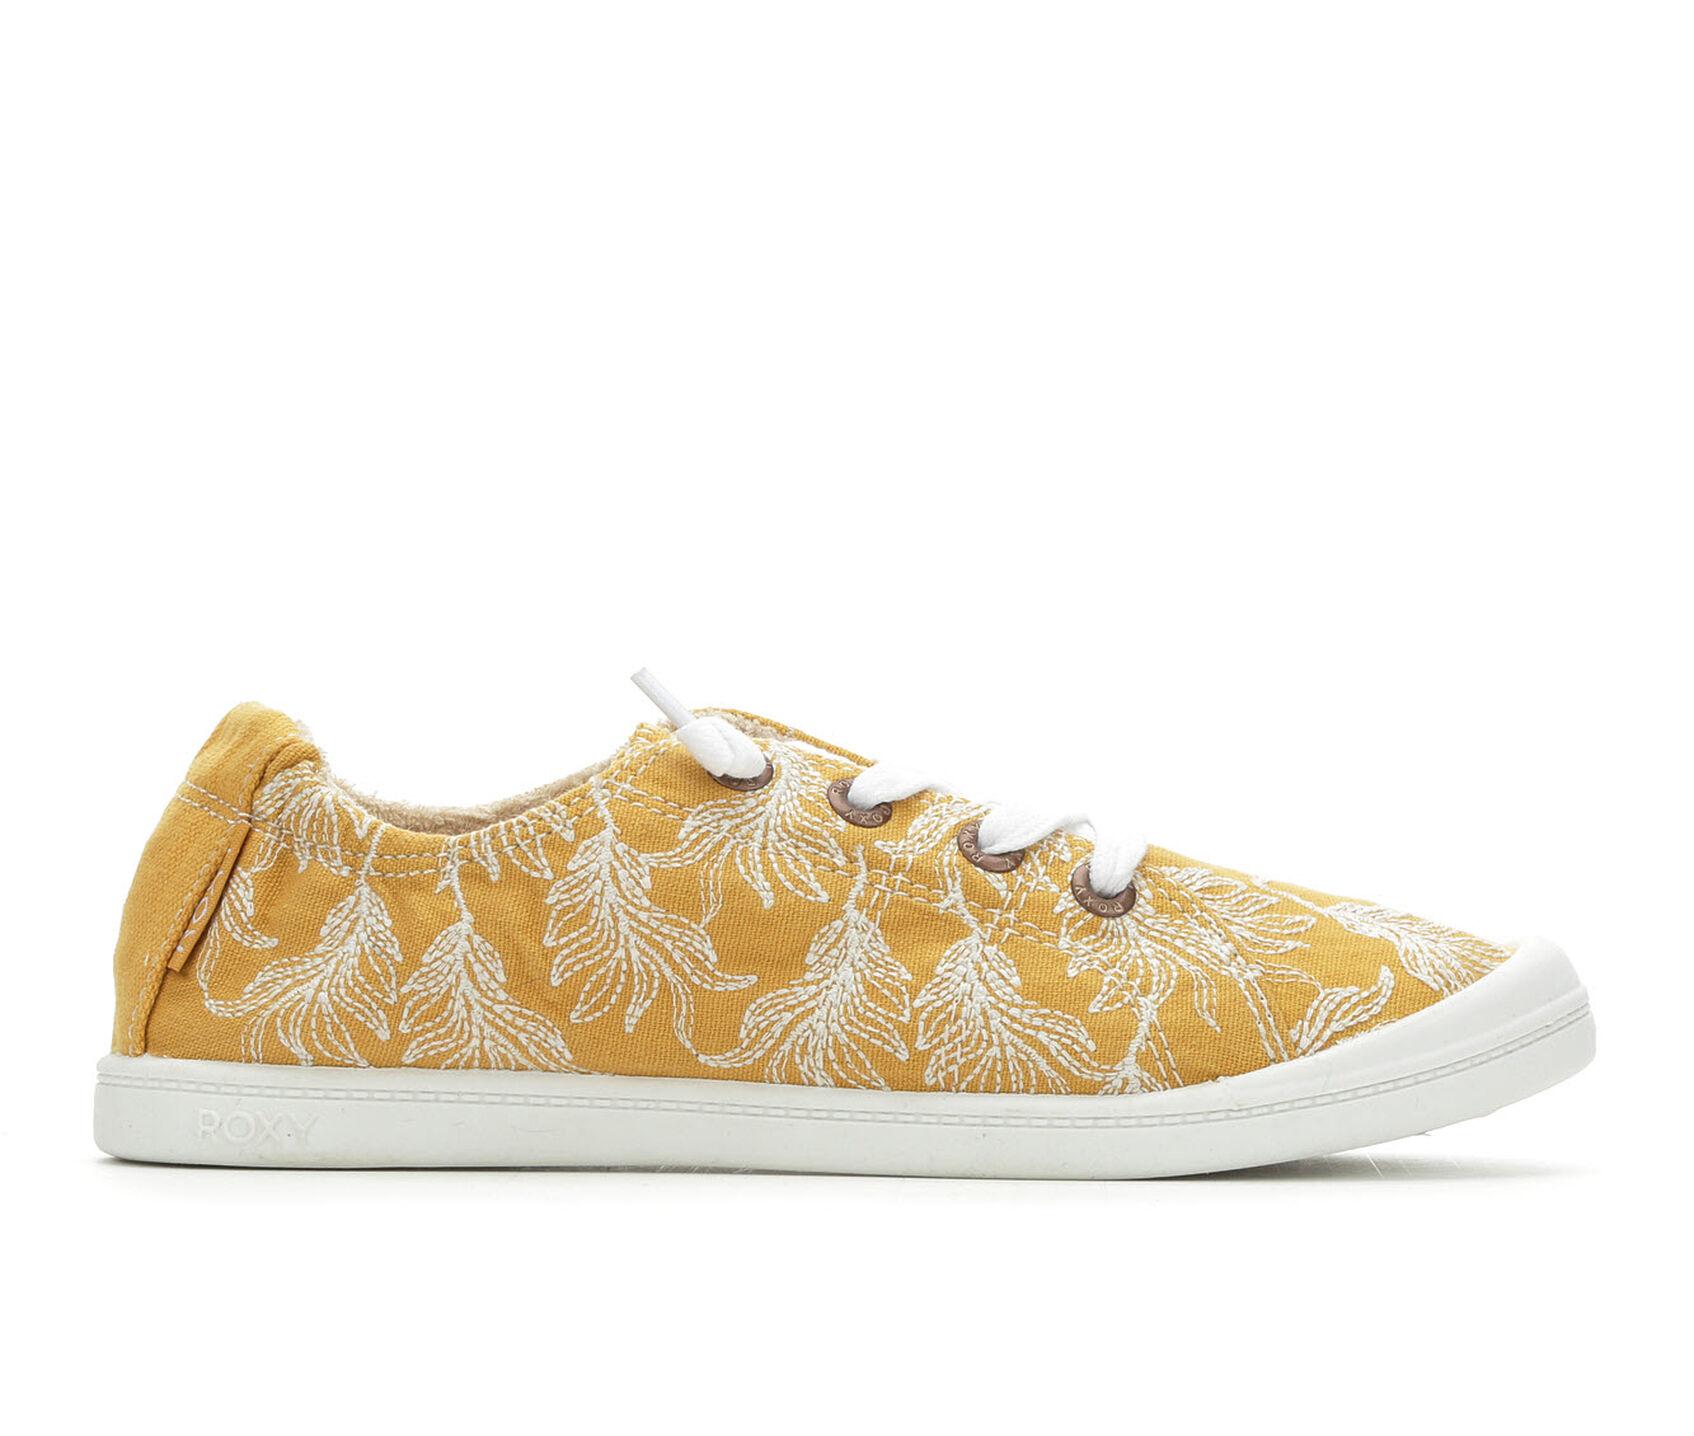 833dc10ce5a77 Women's Roxy Bayshore Sneakers | Shoe Carnival